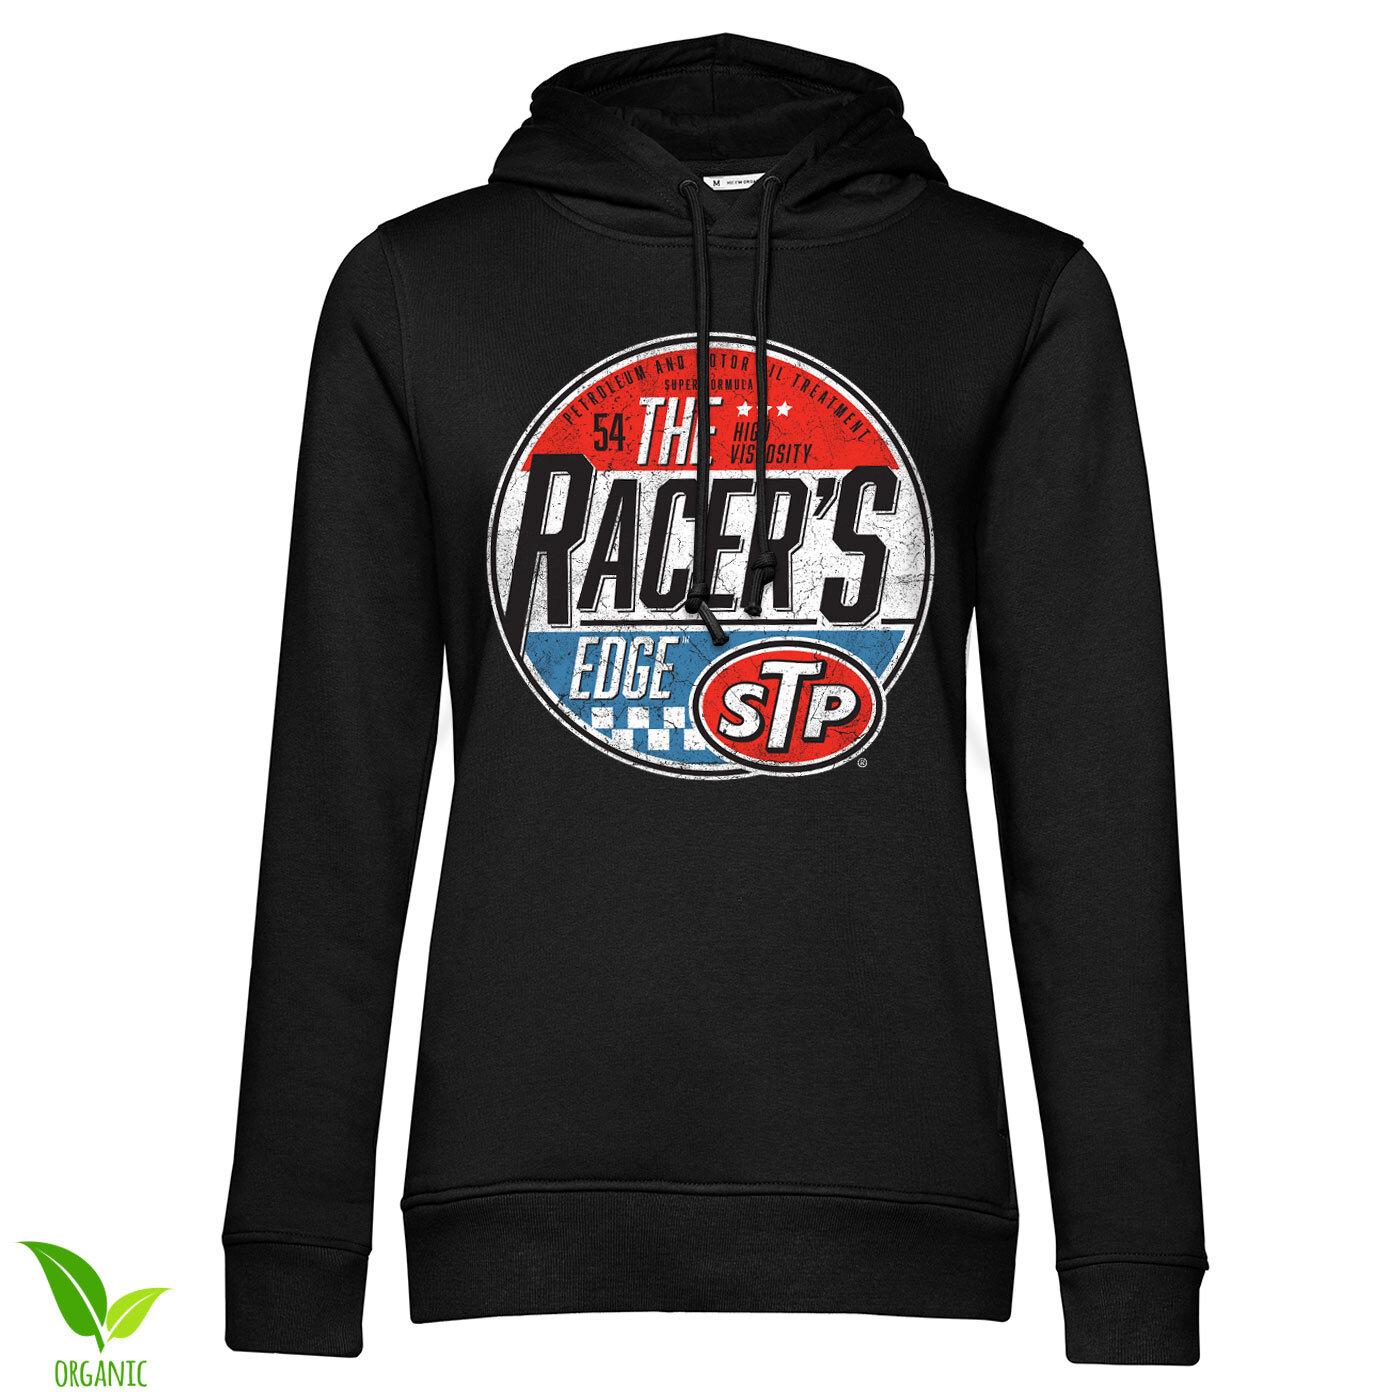 STP - The Racer's Edge Girls Hoodie